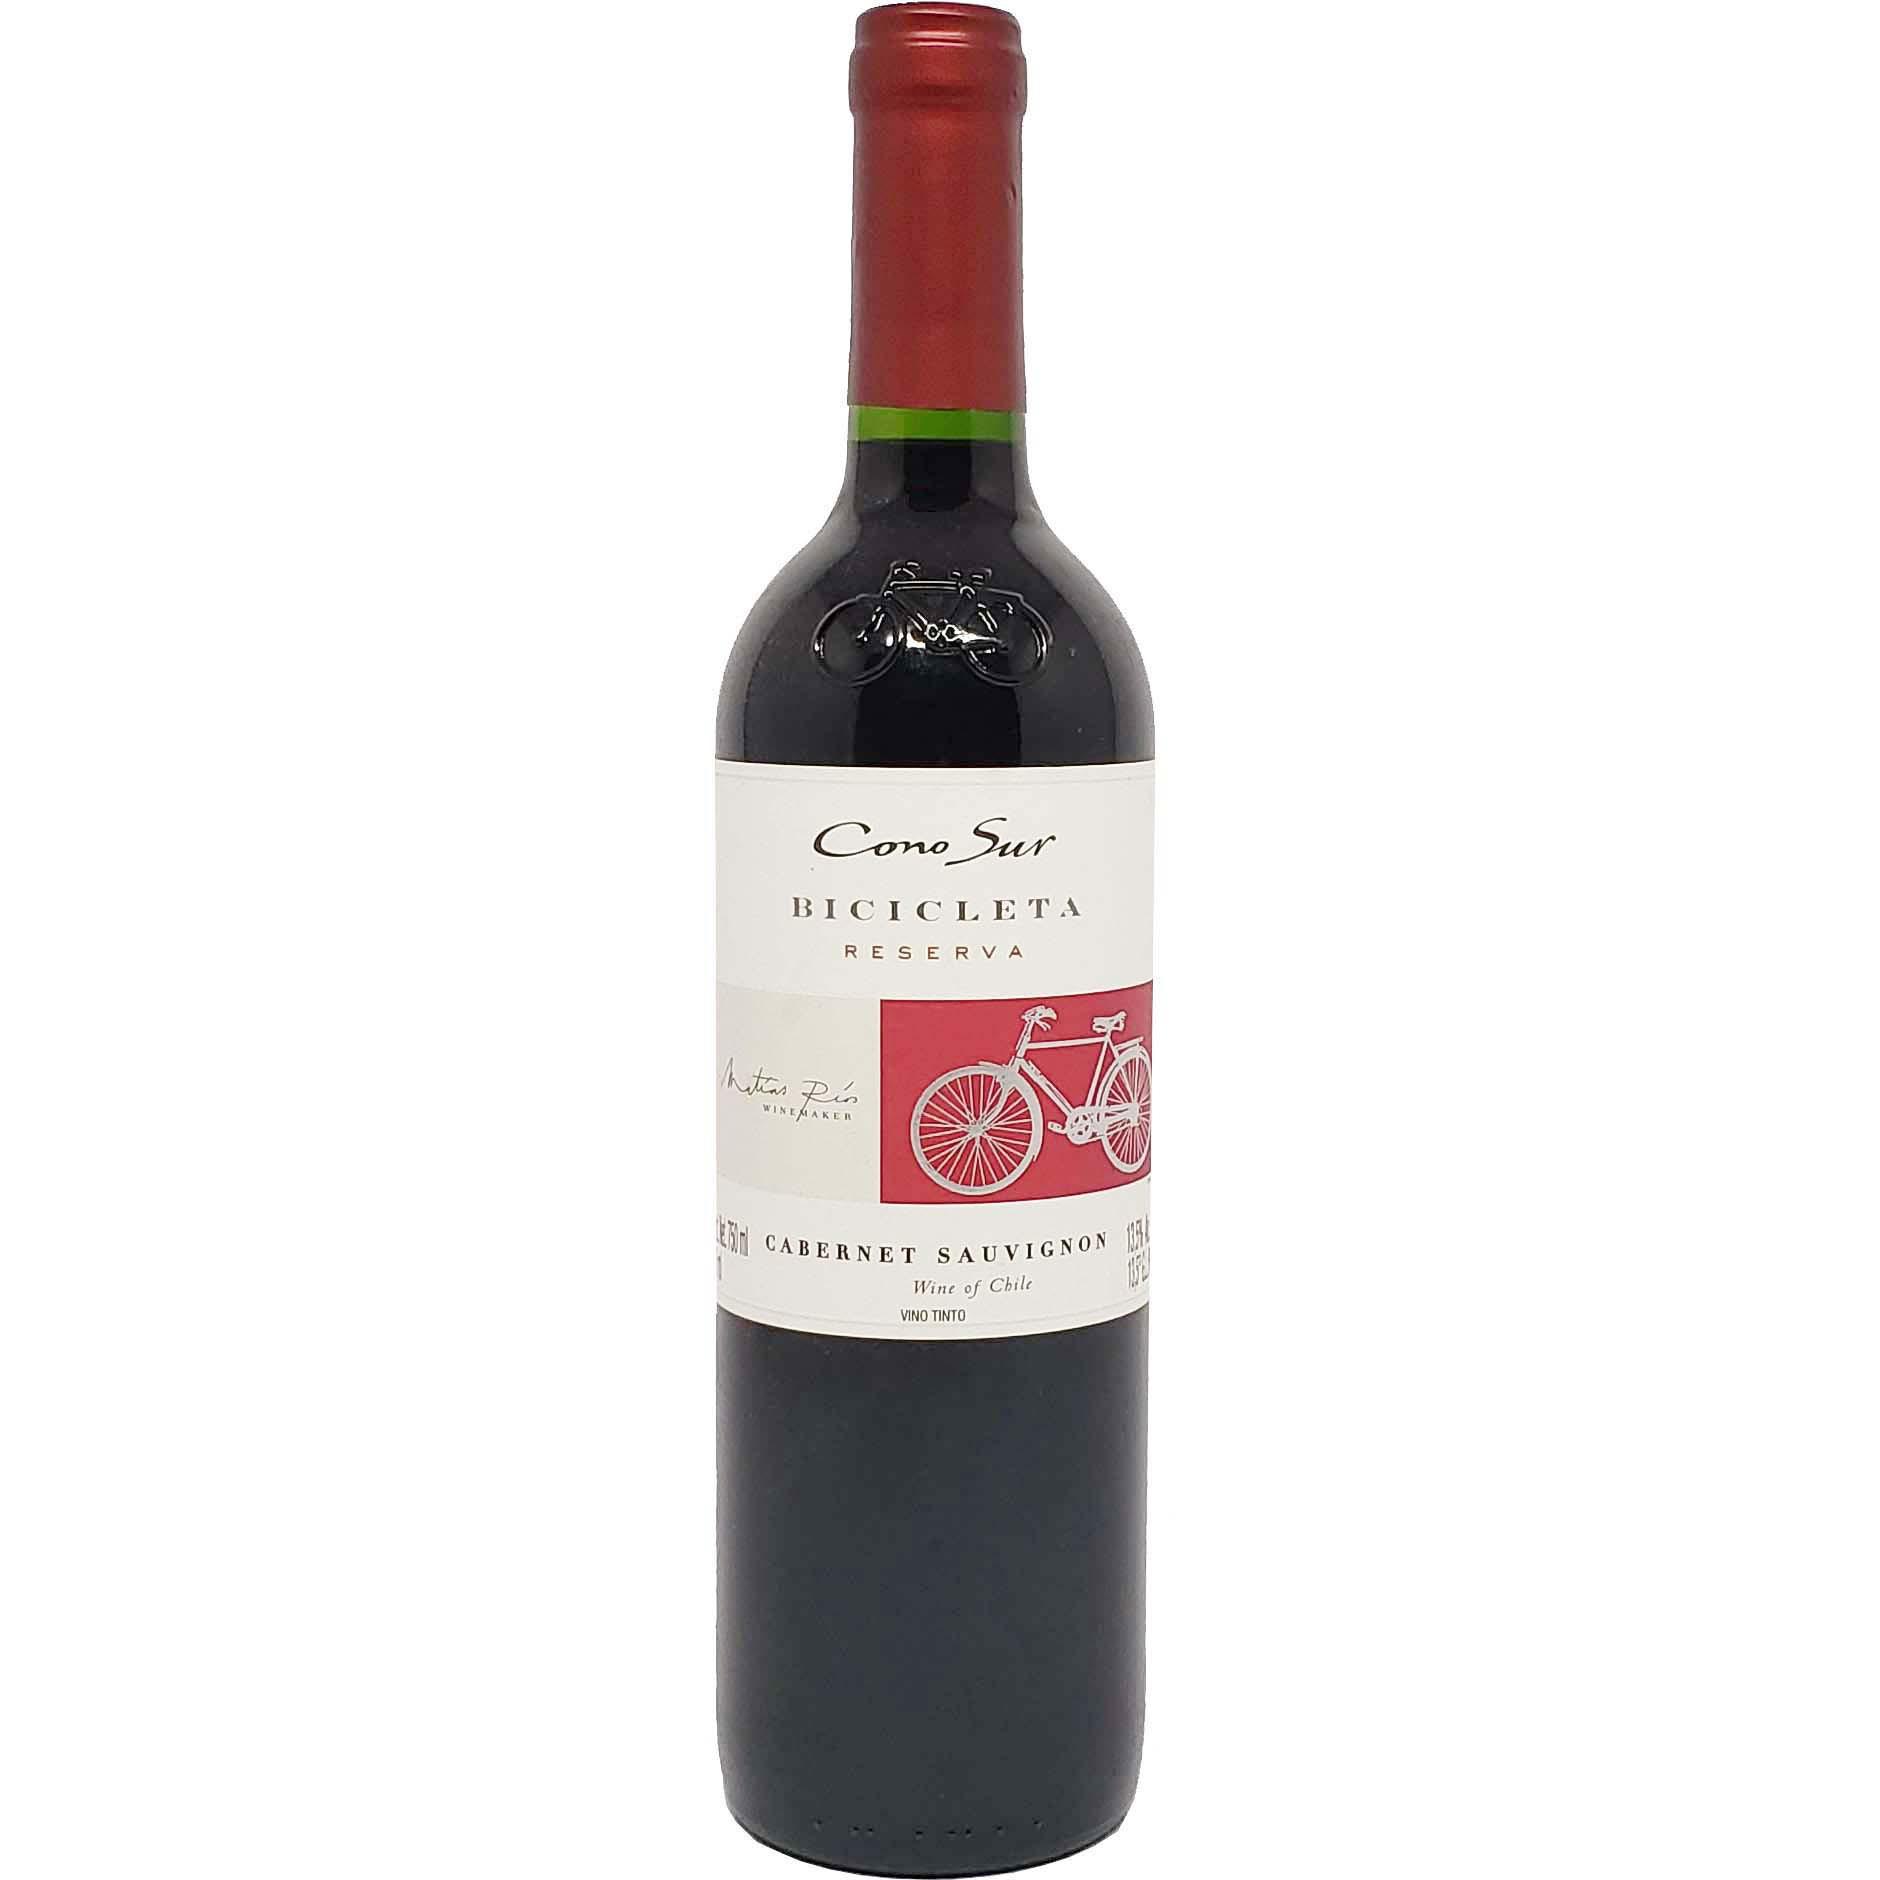 Vinho Tinto Bicicleta Cono Sur Reserva Cabernet Sauvignon - 750ml -